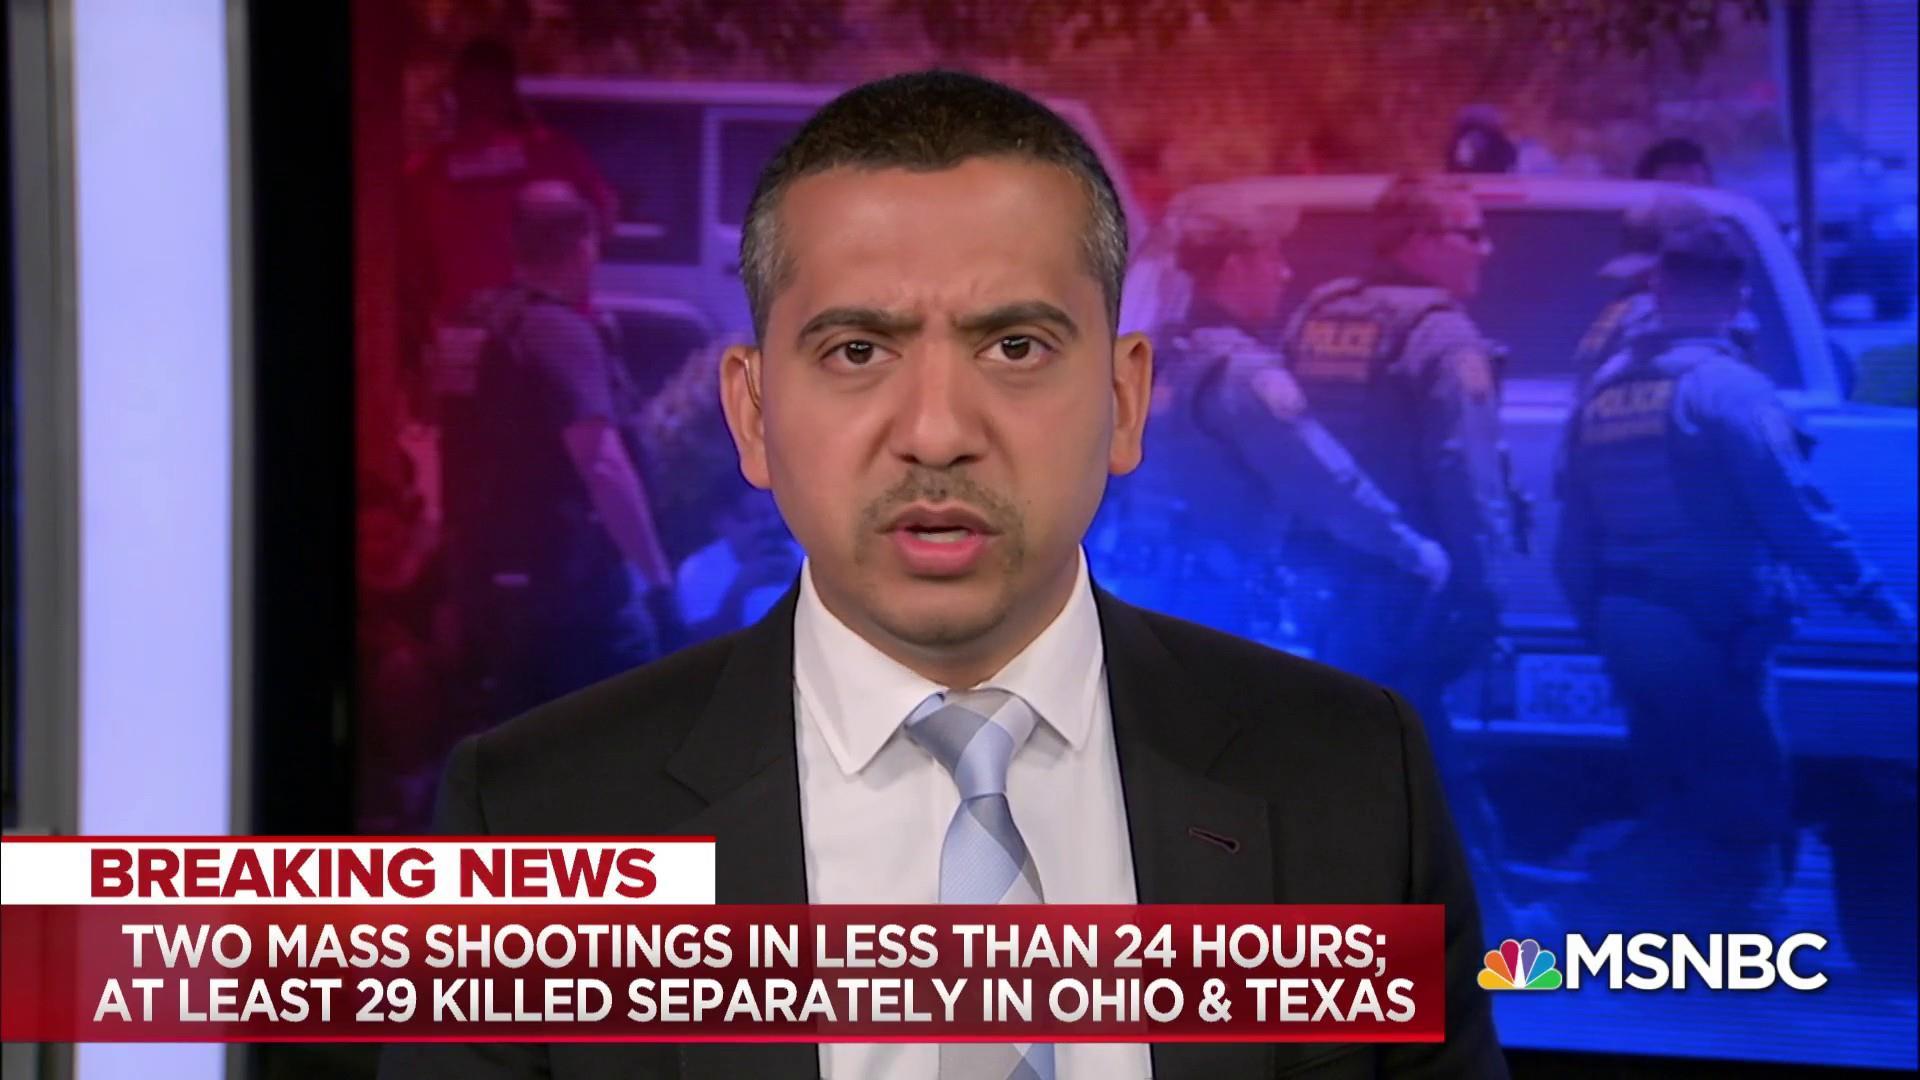 Mehdi Hasan: Hate speech is a Trump problem, not a societal problem